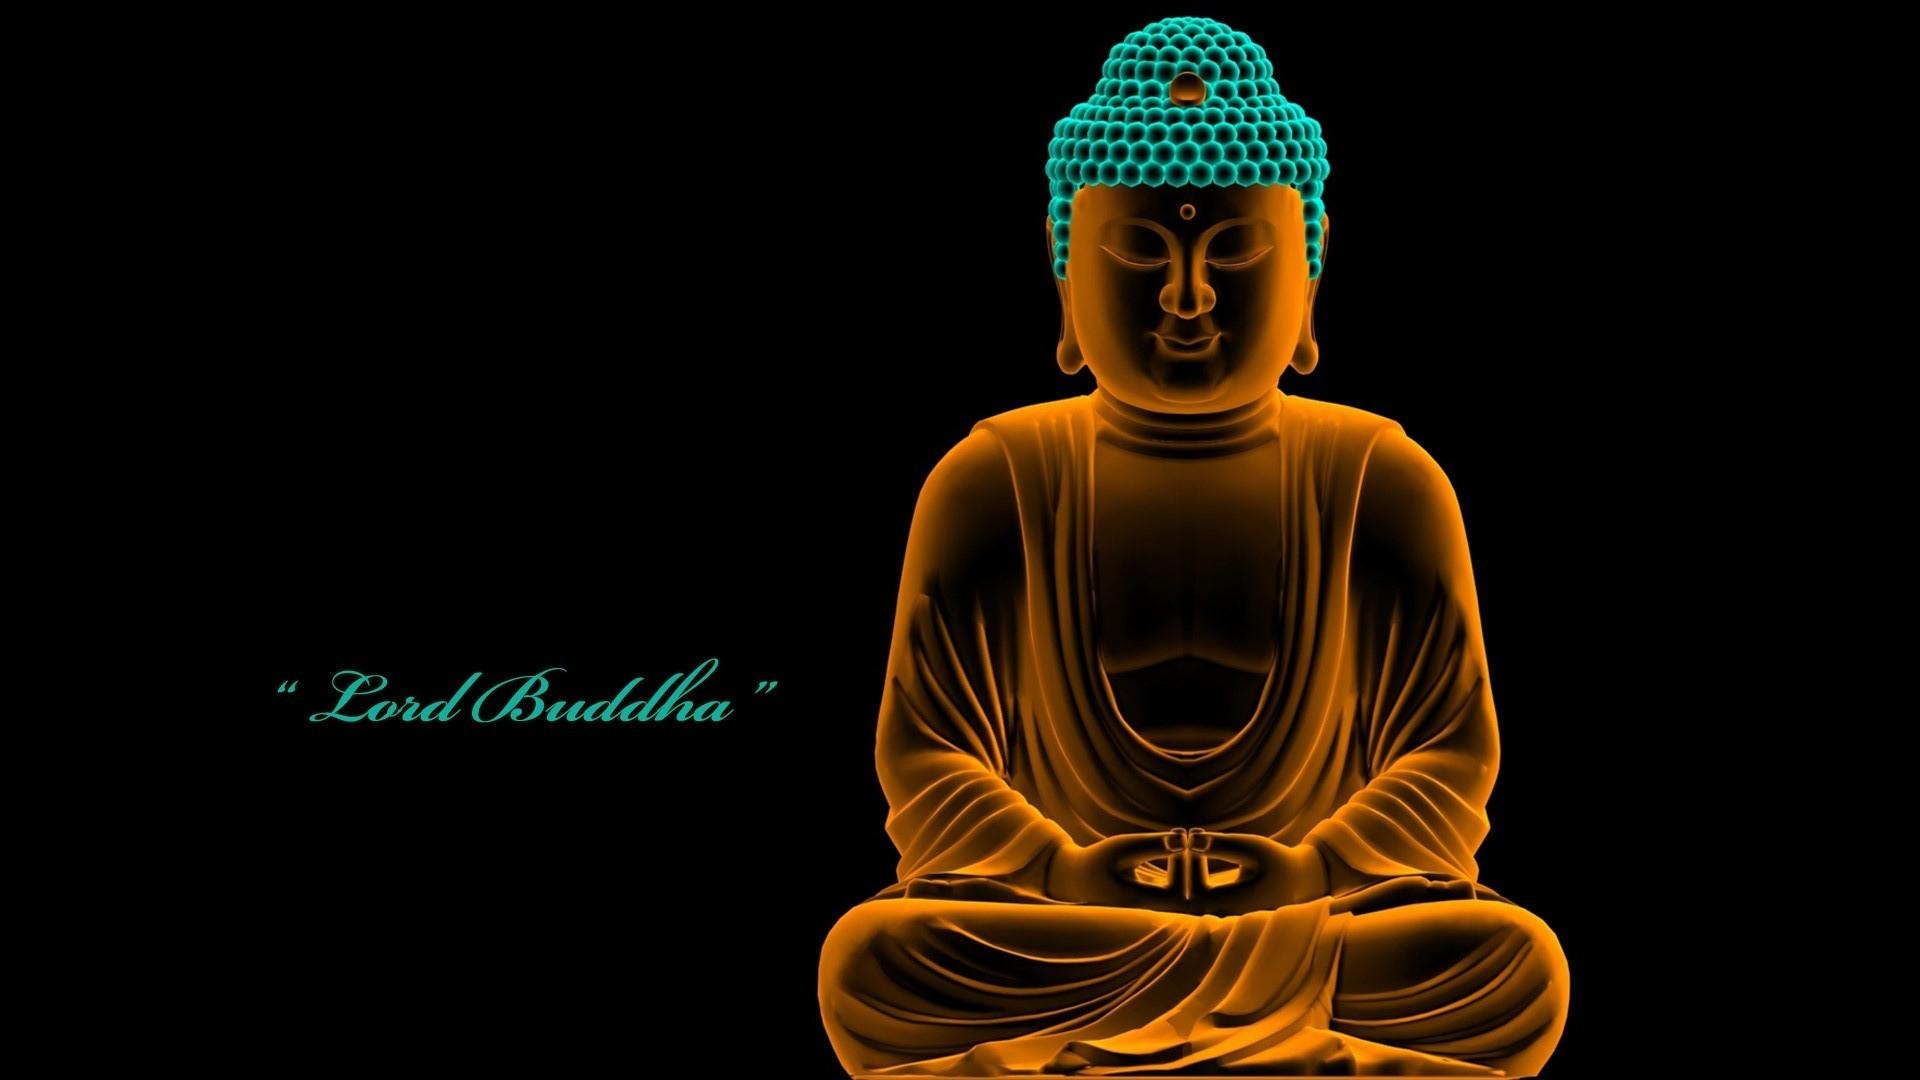 lord buddha tv live - HD1920×1080